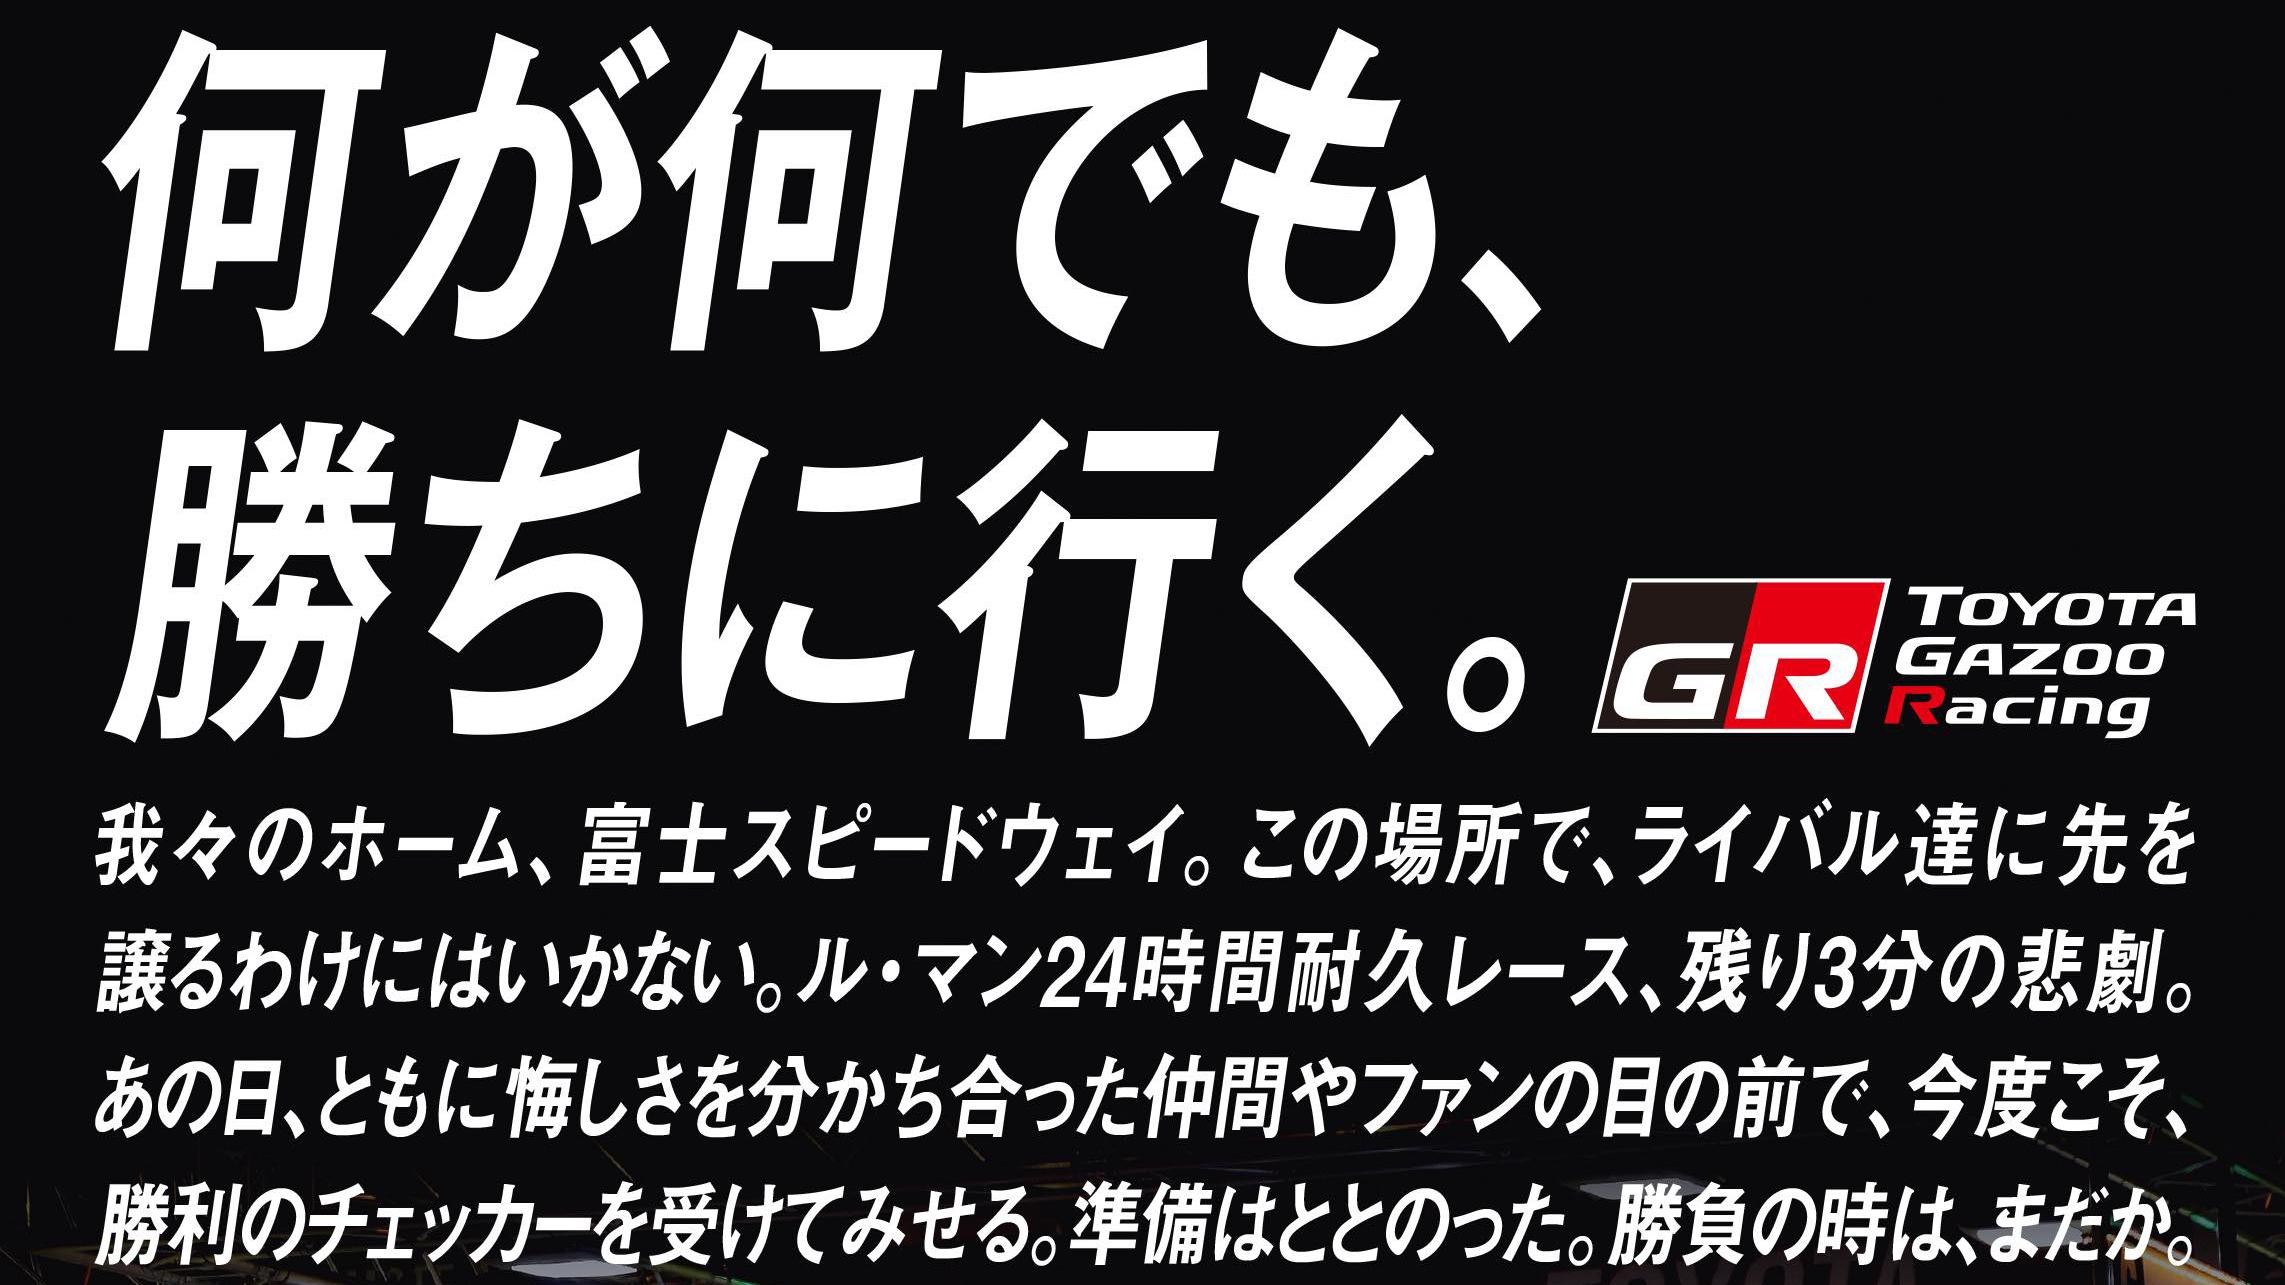 WEC 富士6時間レース